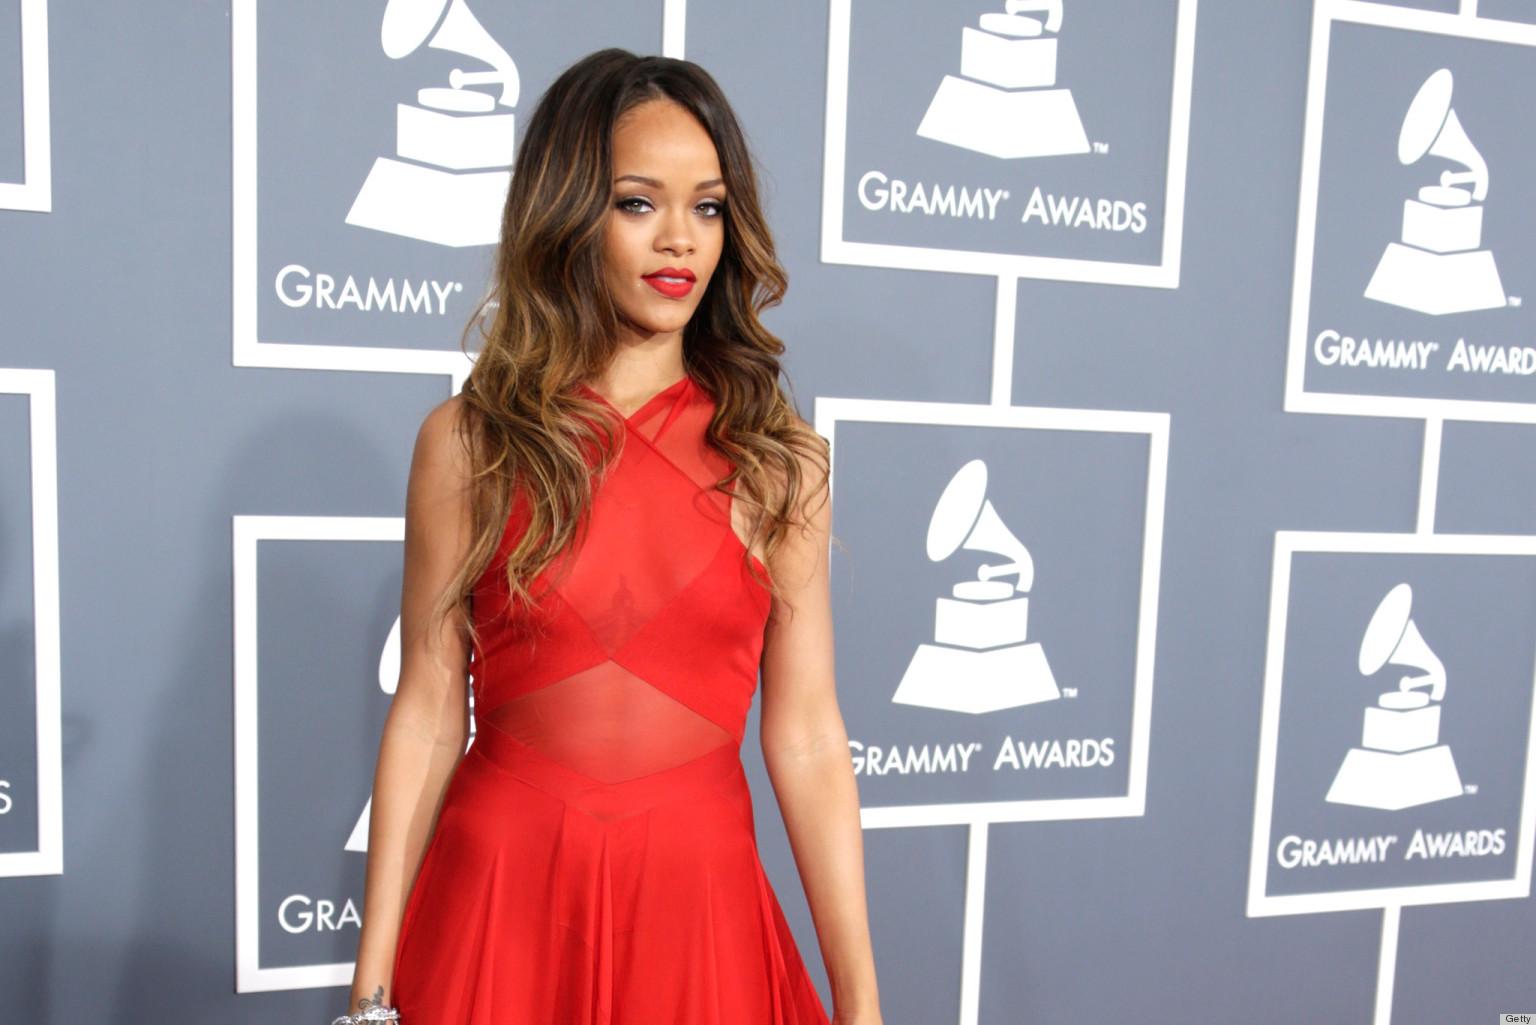 Rihanna's Grammys Dress 2013